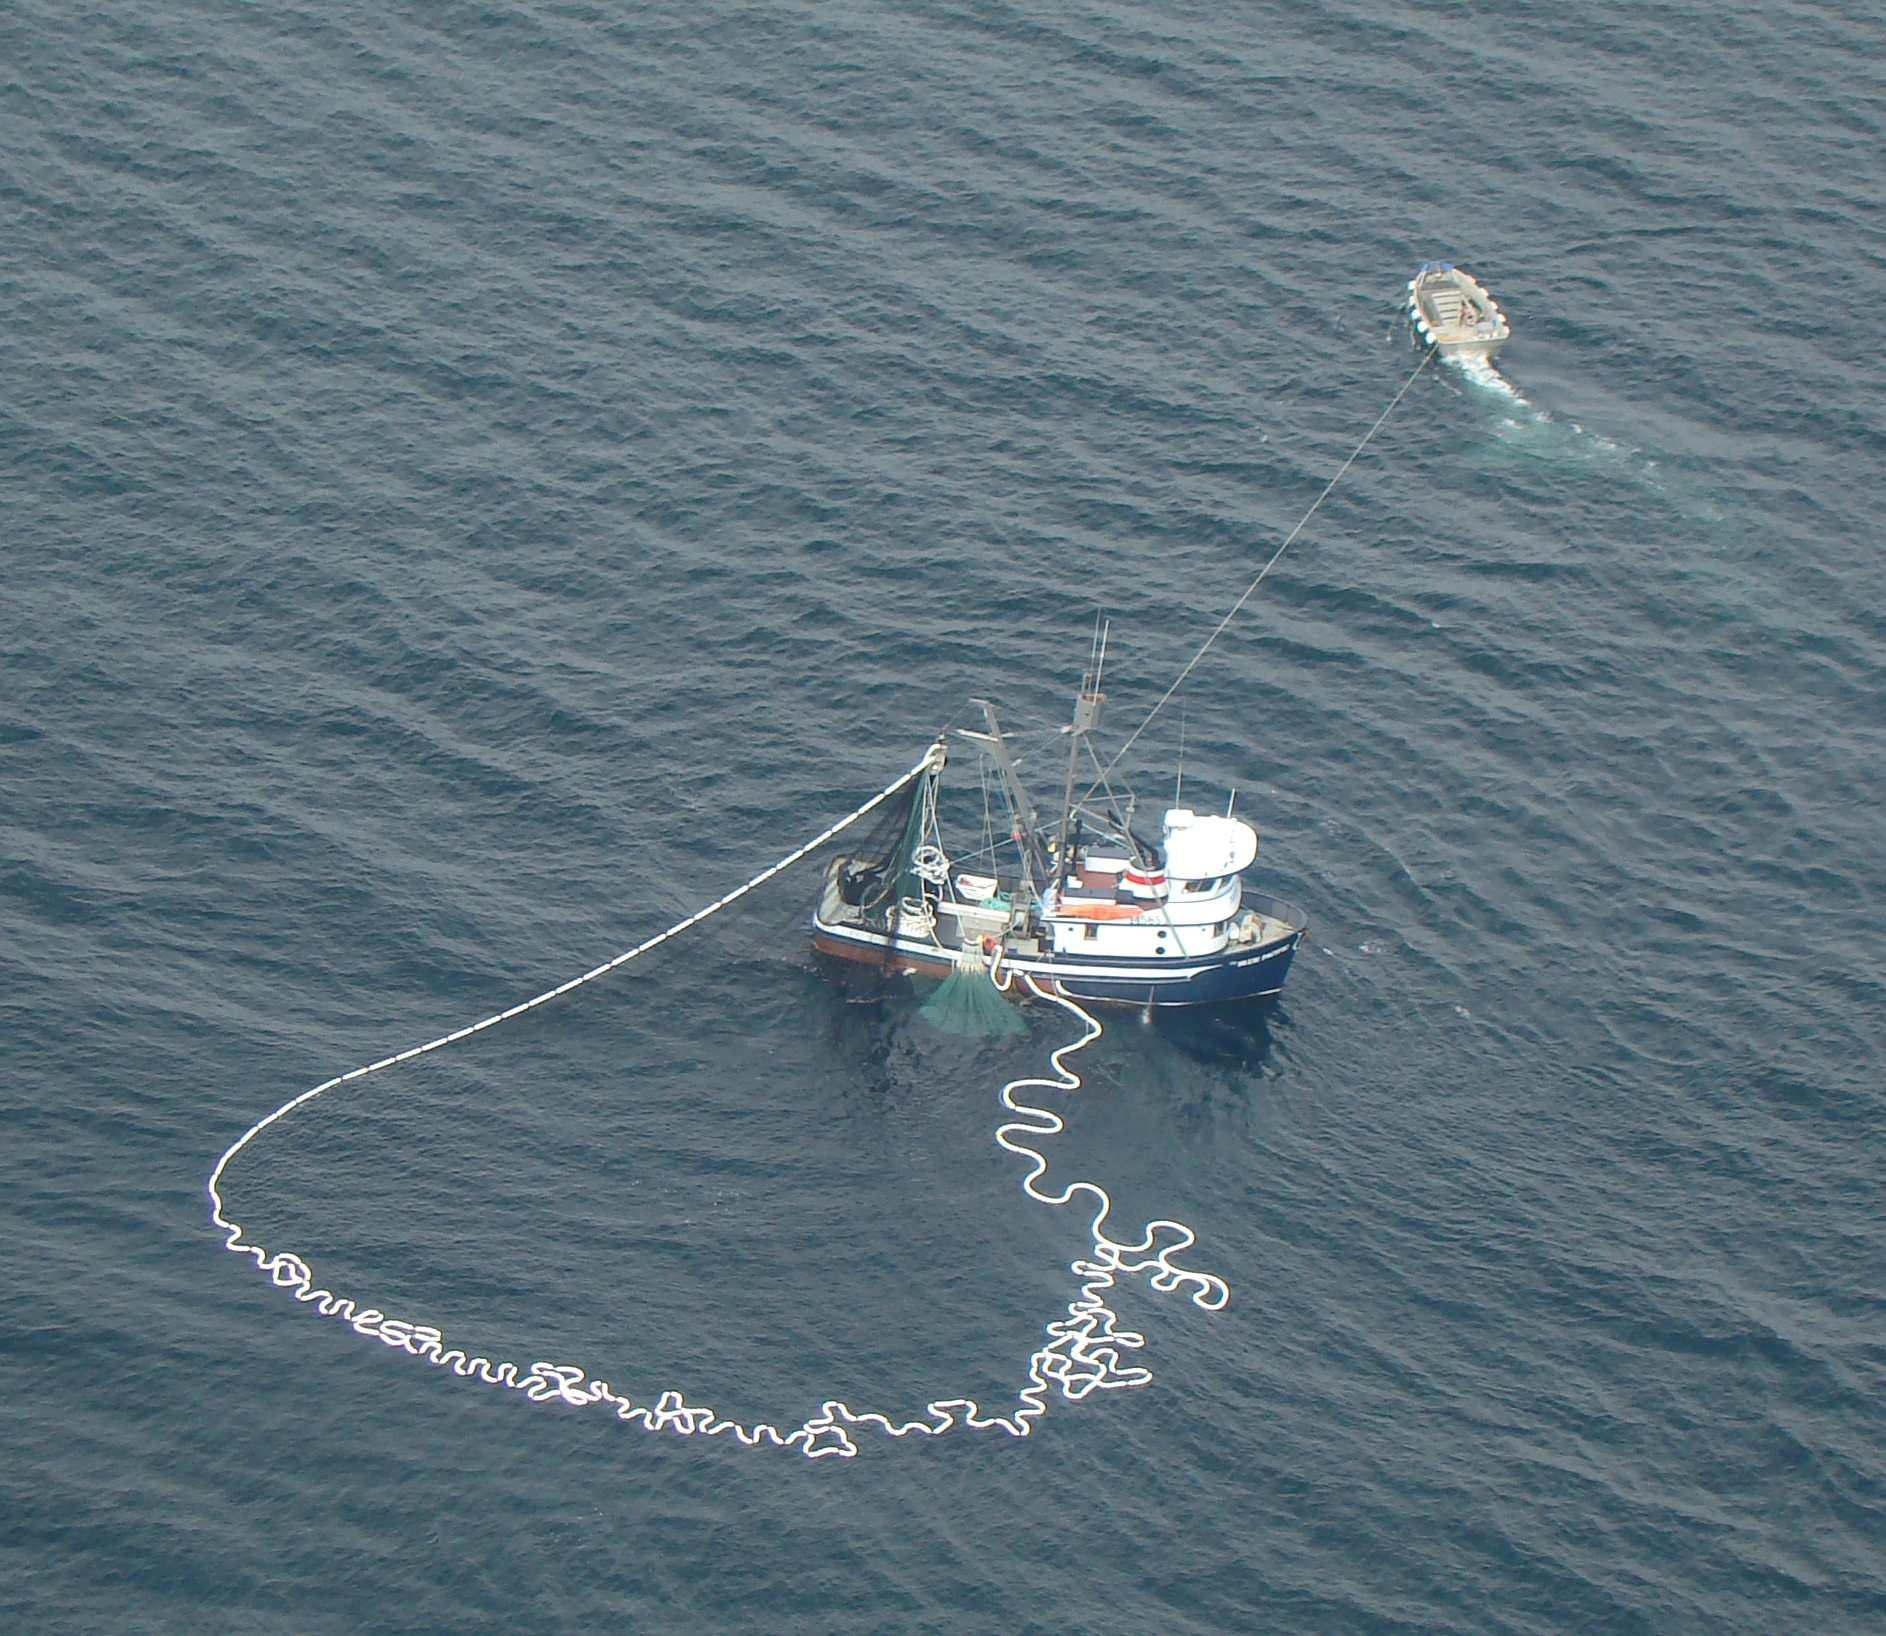 Southeast seine fleet catching pinks, missing chums